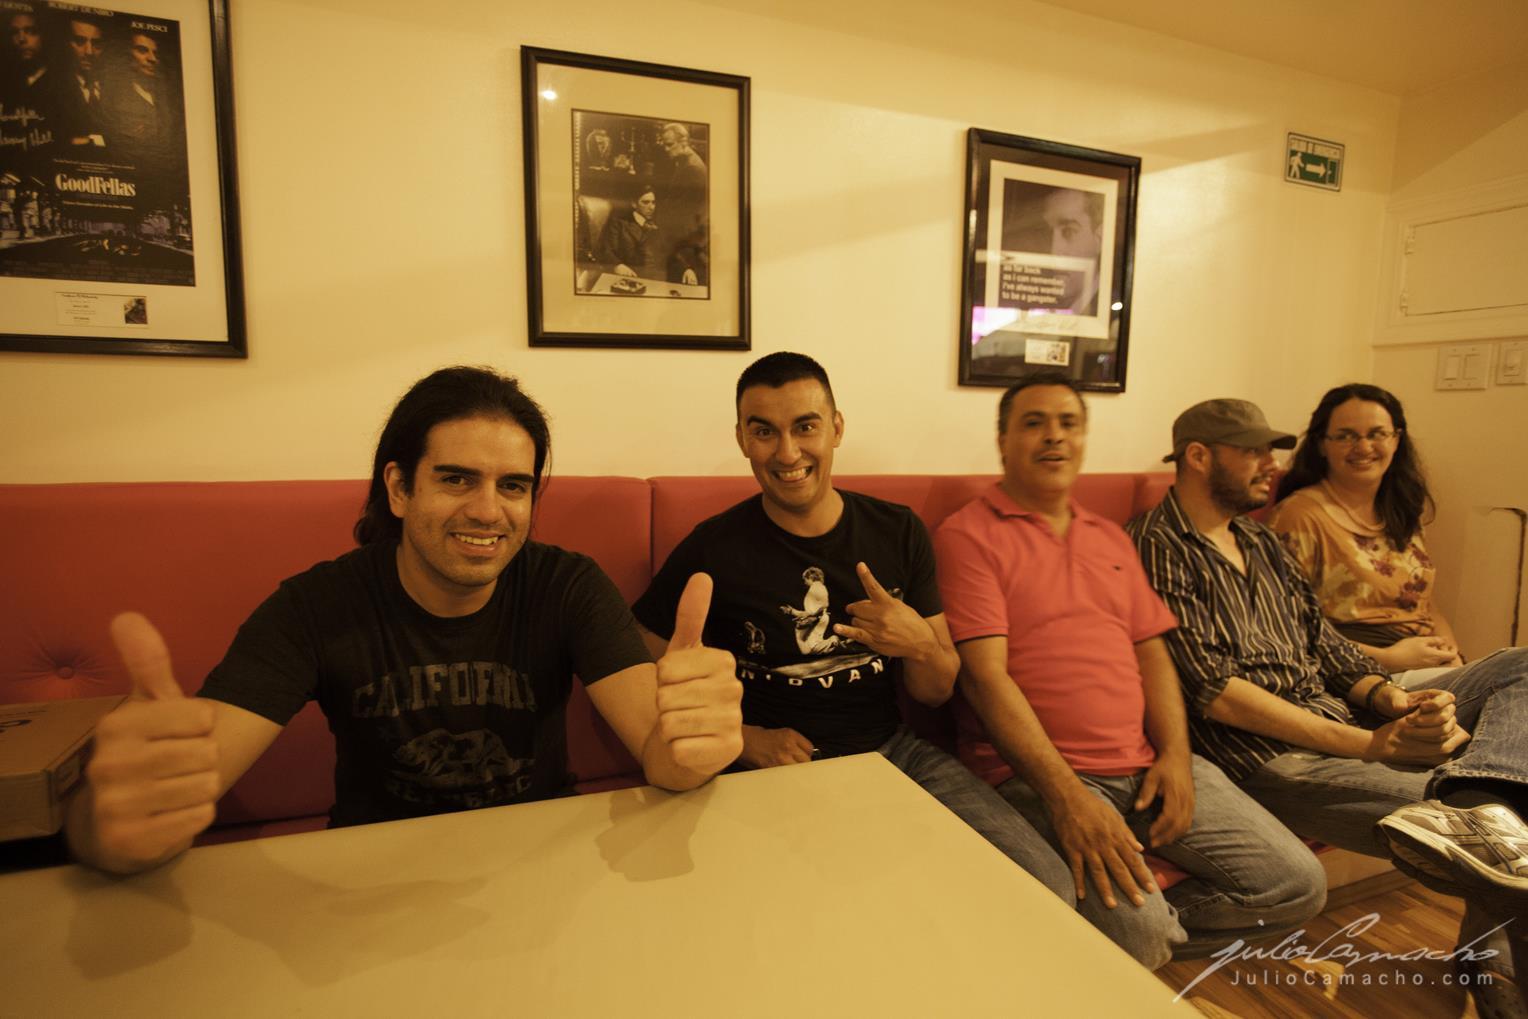 2014-10-30 31 CAST TOUR Ensenada y Tijuana - 1342 - www.Juli (Copy).jpg